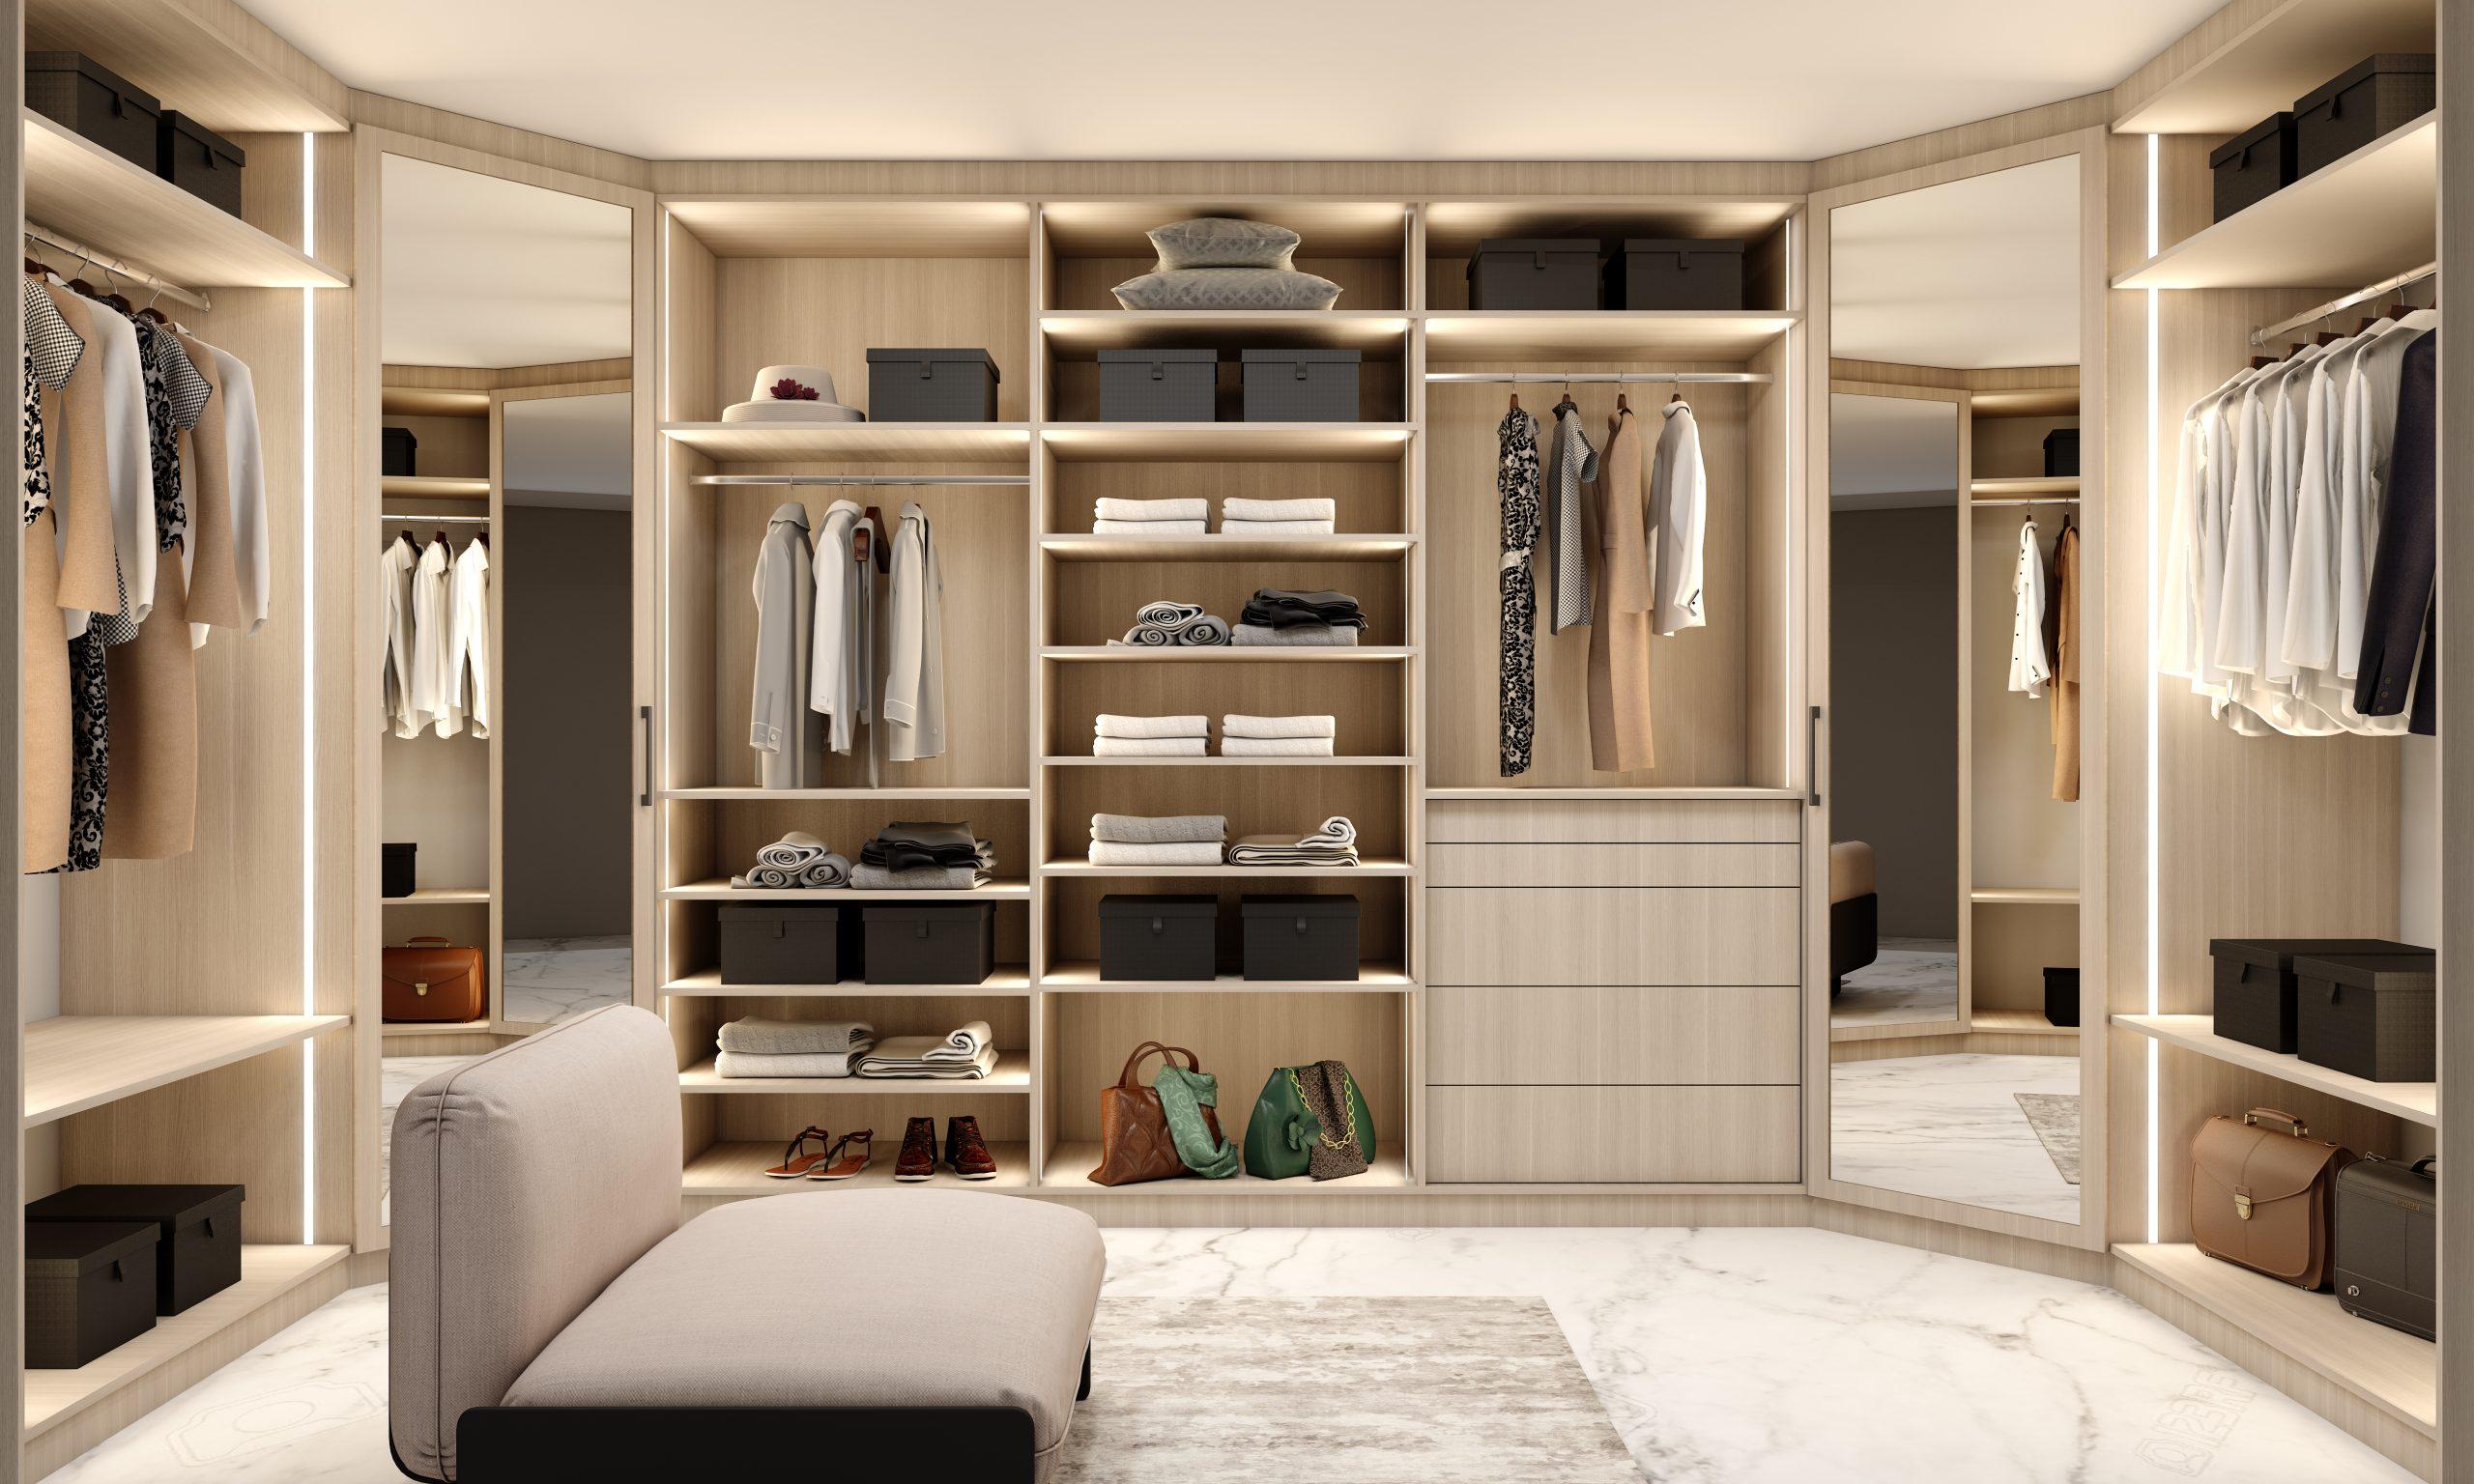 Modern walk-in fitted wardrobe in sab oak finishle light woodgrain finish with framed mirror corner wardrobe